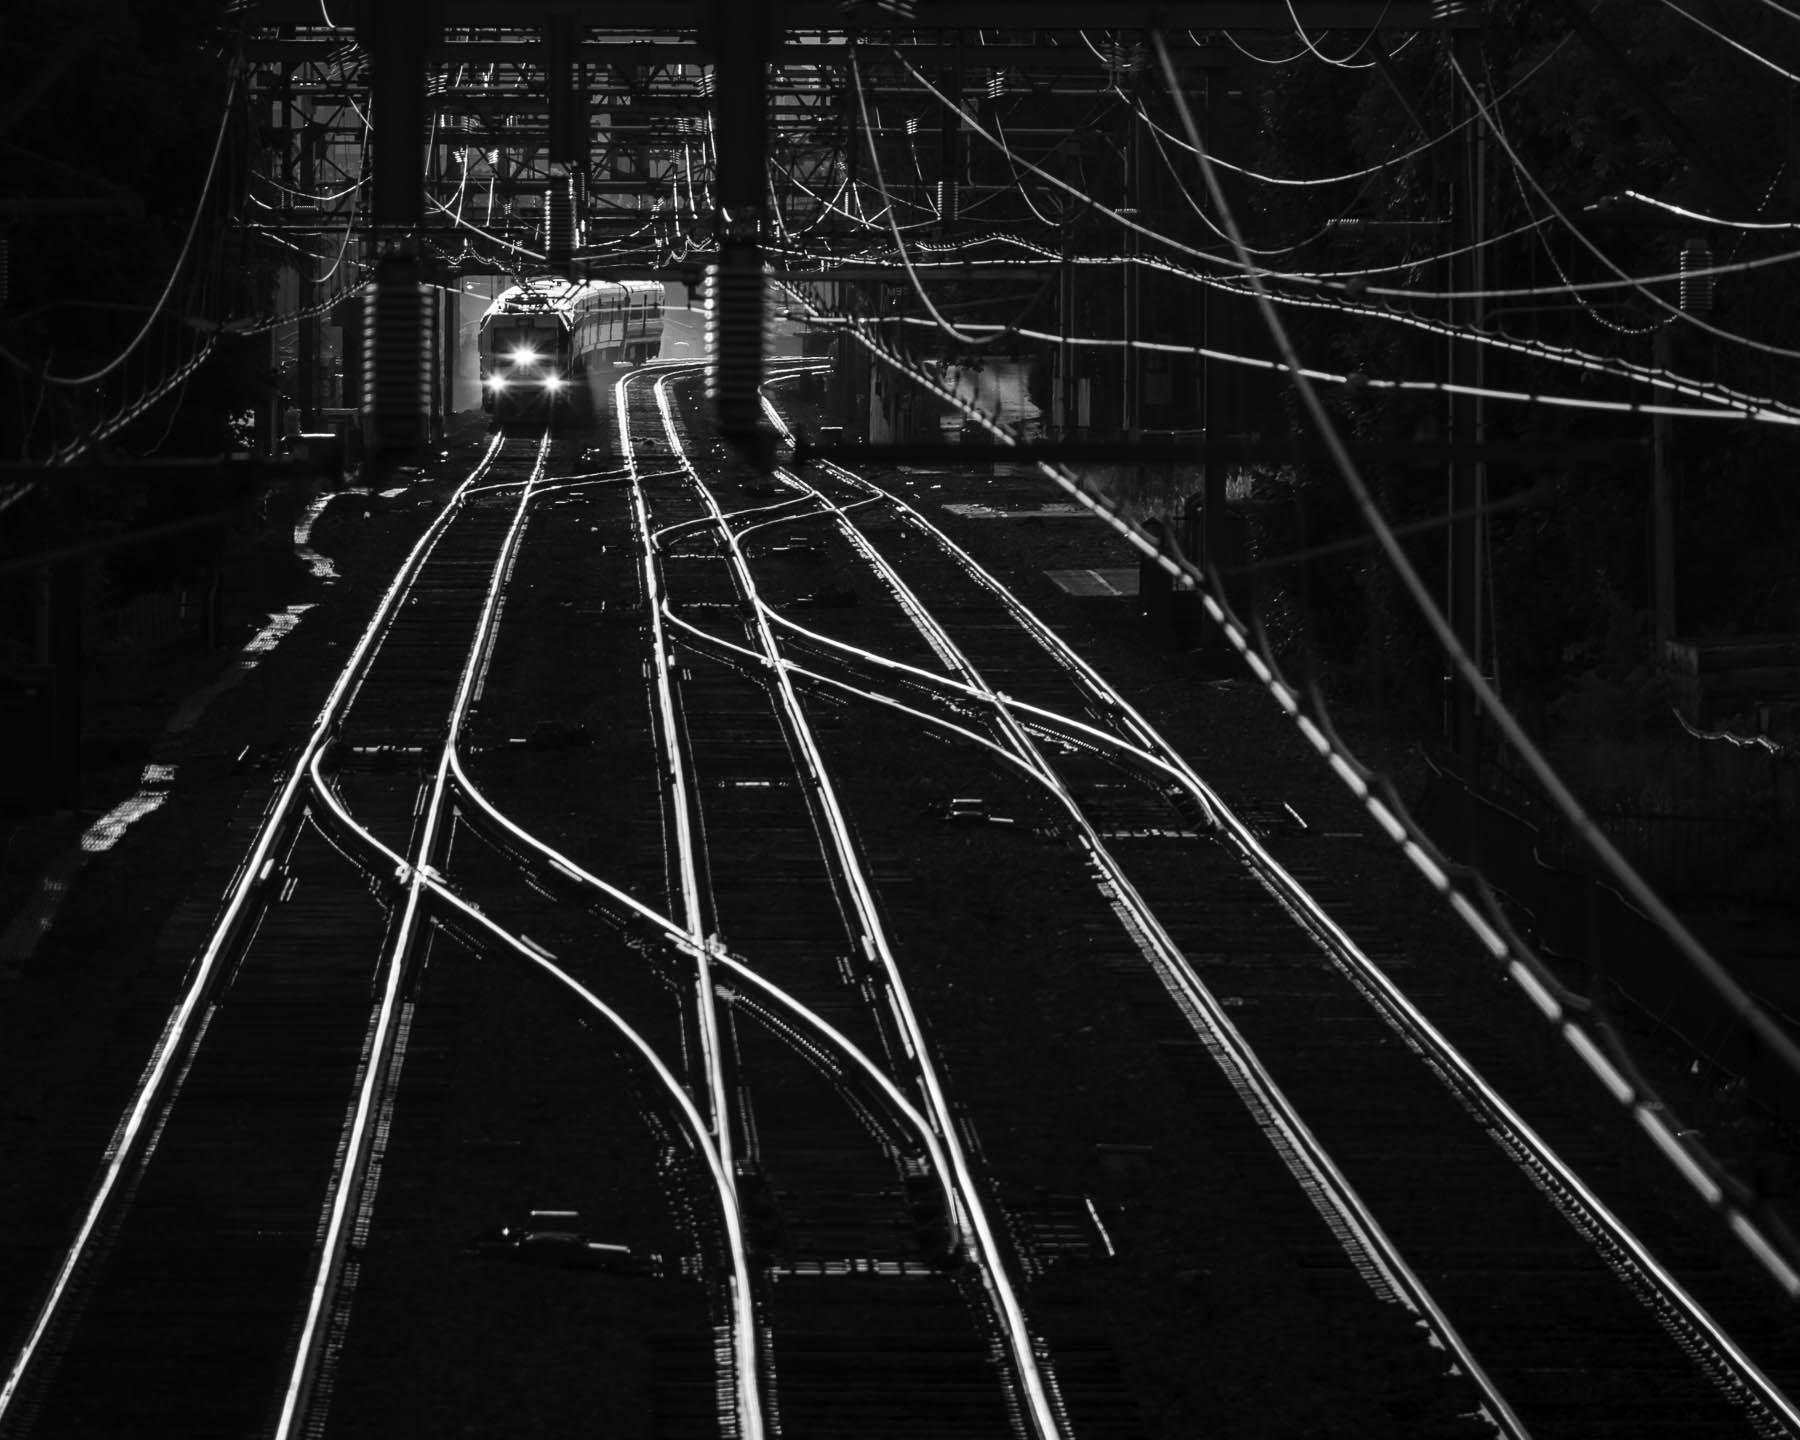 34_Eric_Williams_Conduits of Steel_Commuter Corridor_2.jpg